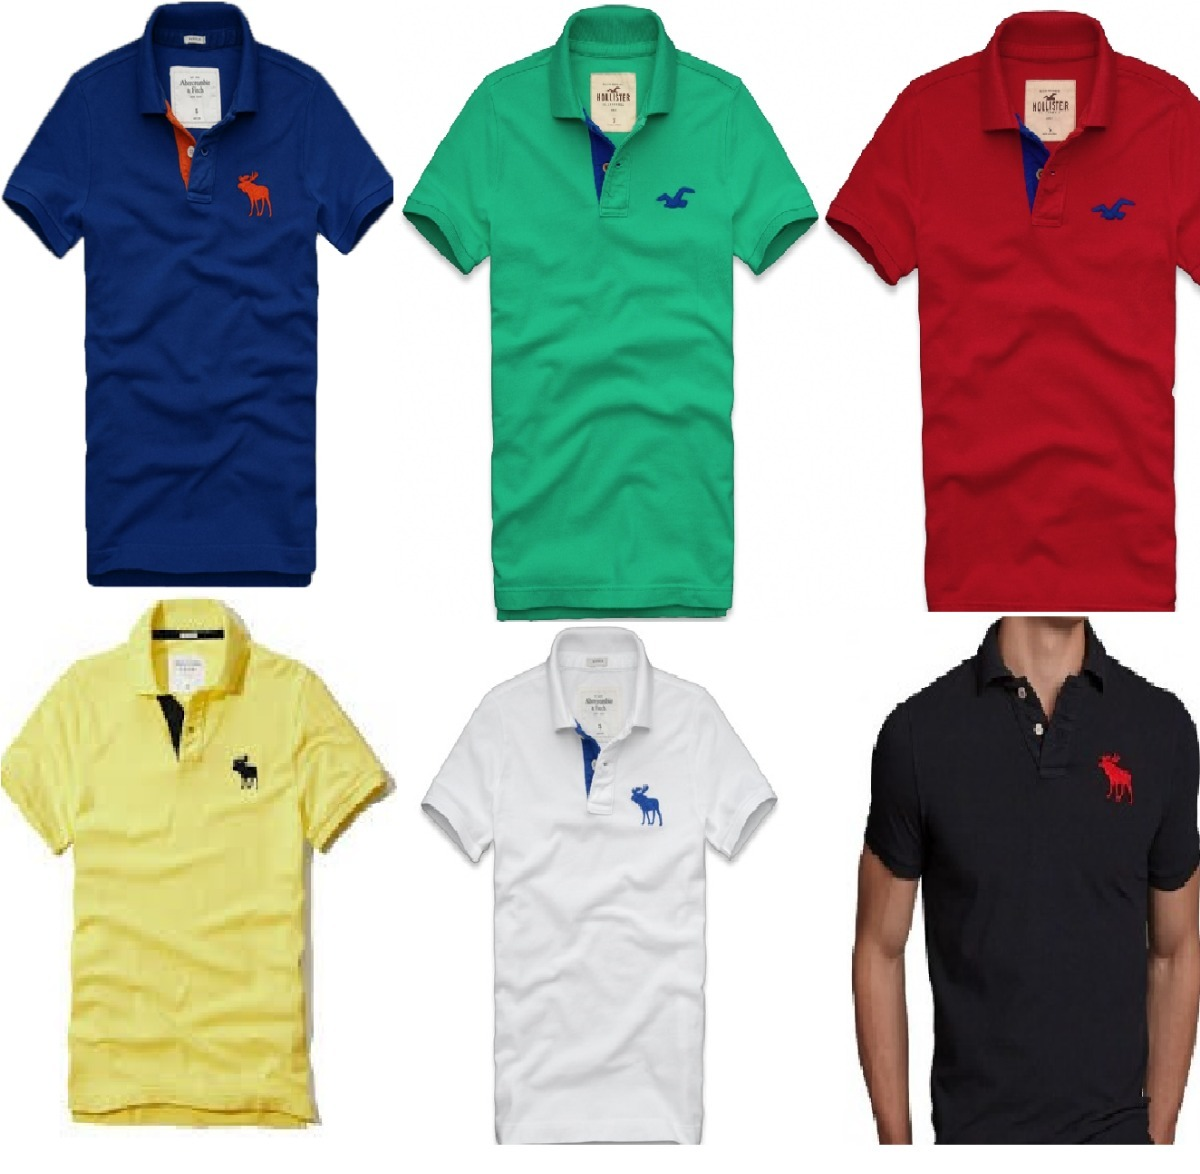 9f0f0dc734 ... camisa polo masculina todo o brasil. Carregando zoom.